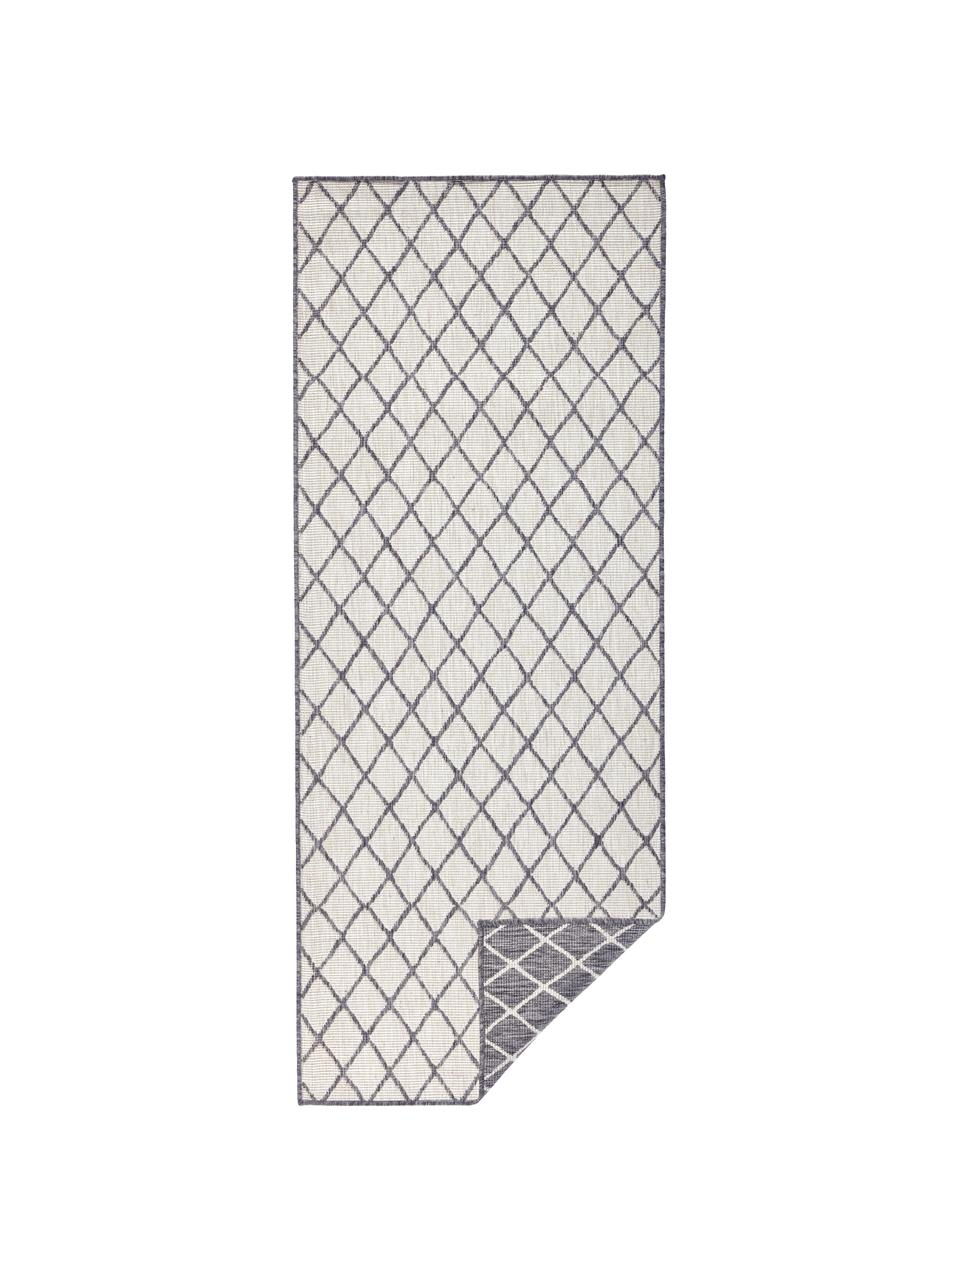 Passatoia reversibile da interno-esterno Malaga, Grigio, crema, Larg. 80 x Lung. 250 cm